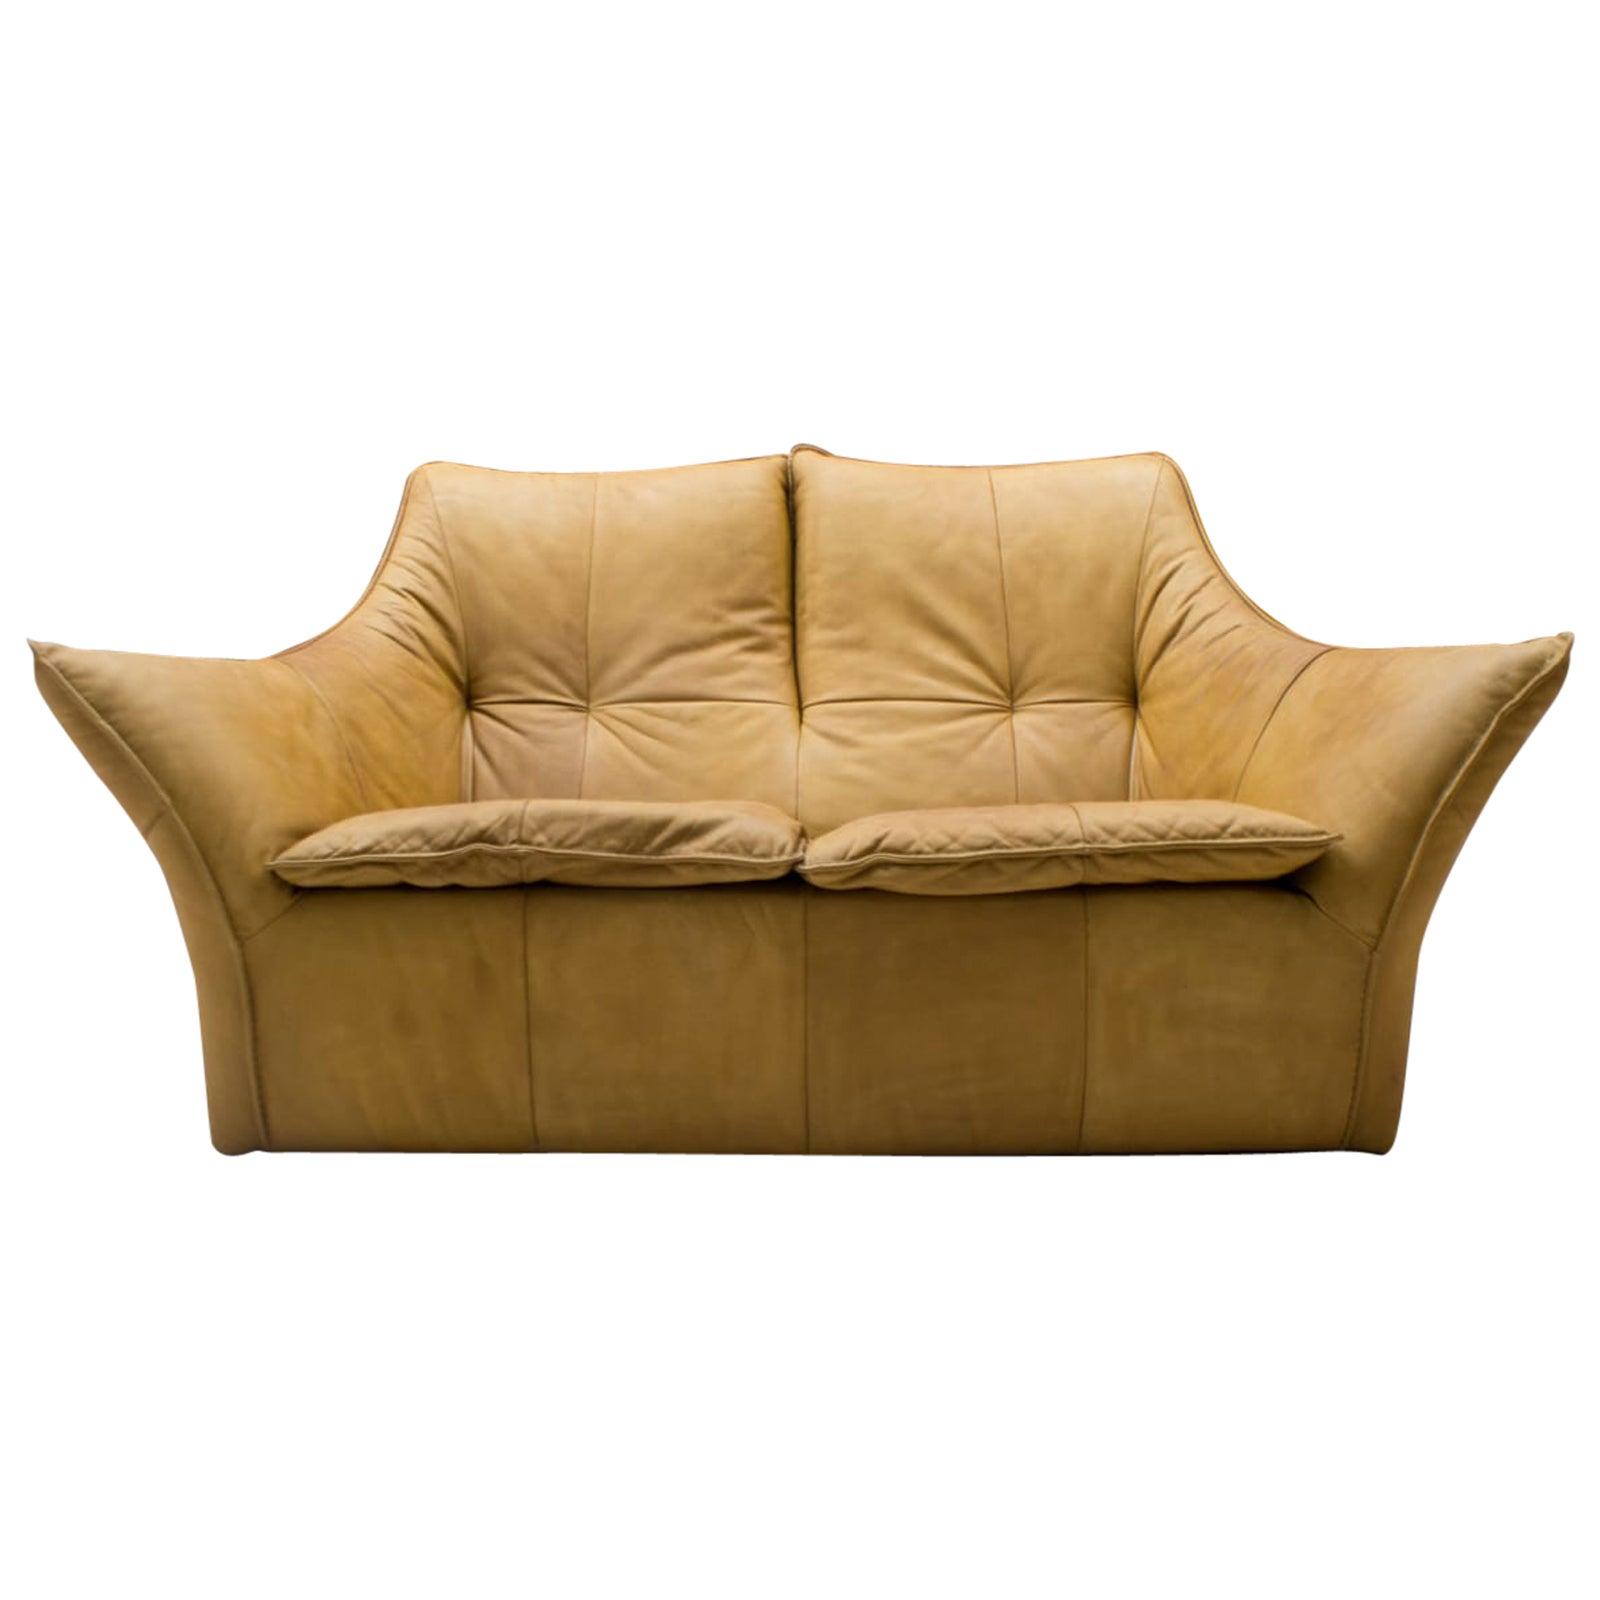 'Denver' 2-Seat Leather Sofa by Gerard Van Den Berg for Montis, 1970s